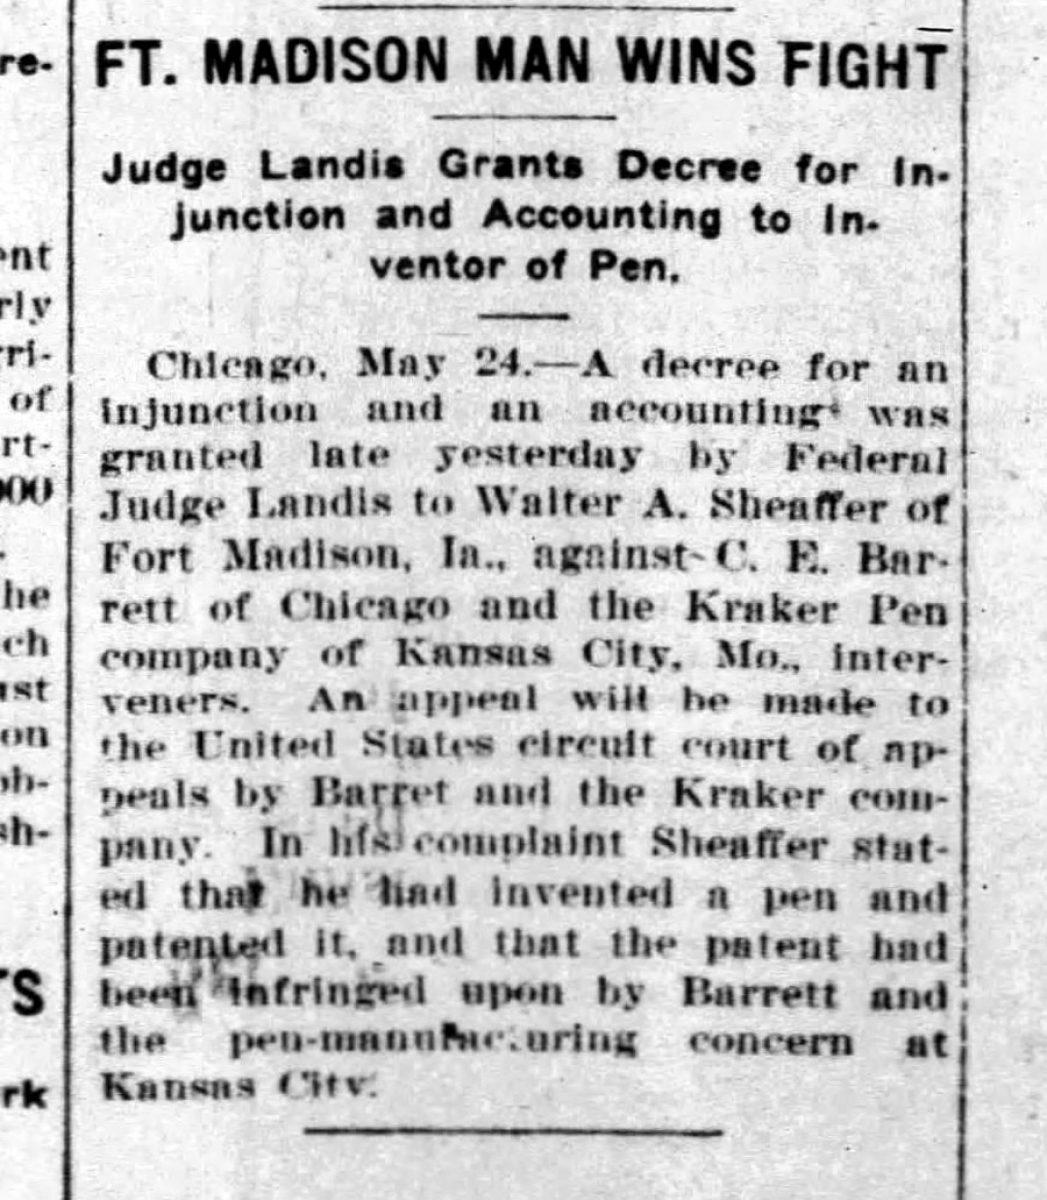 1917 05 23 Fort Madison Man Wins Fight tne news palladium 1917 05 24